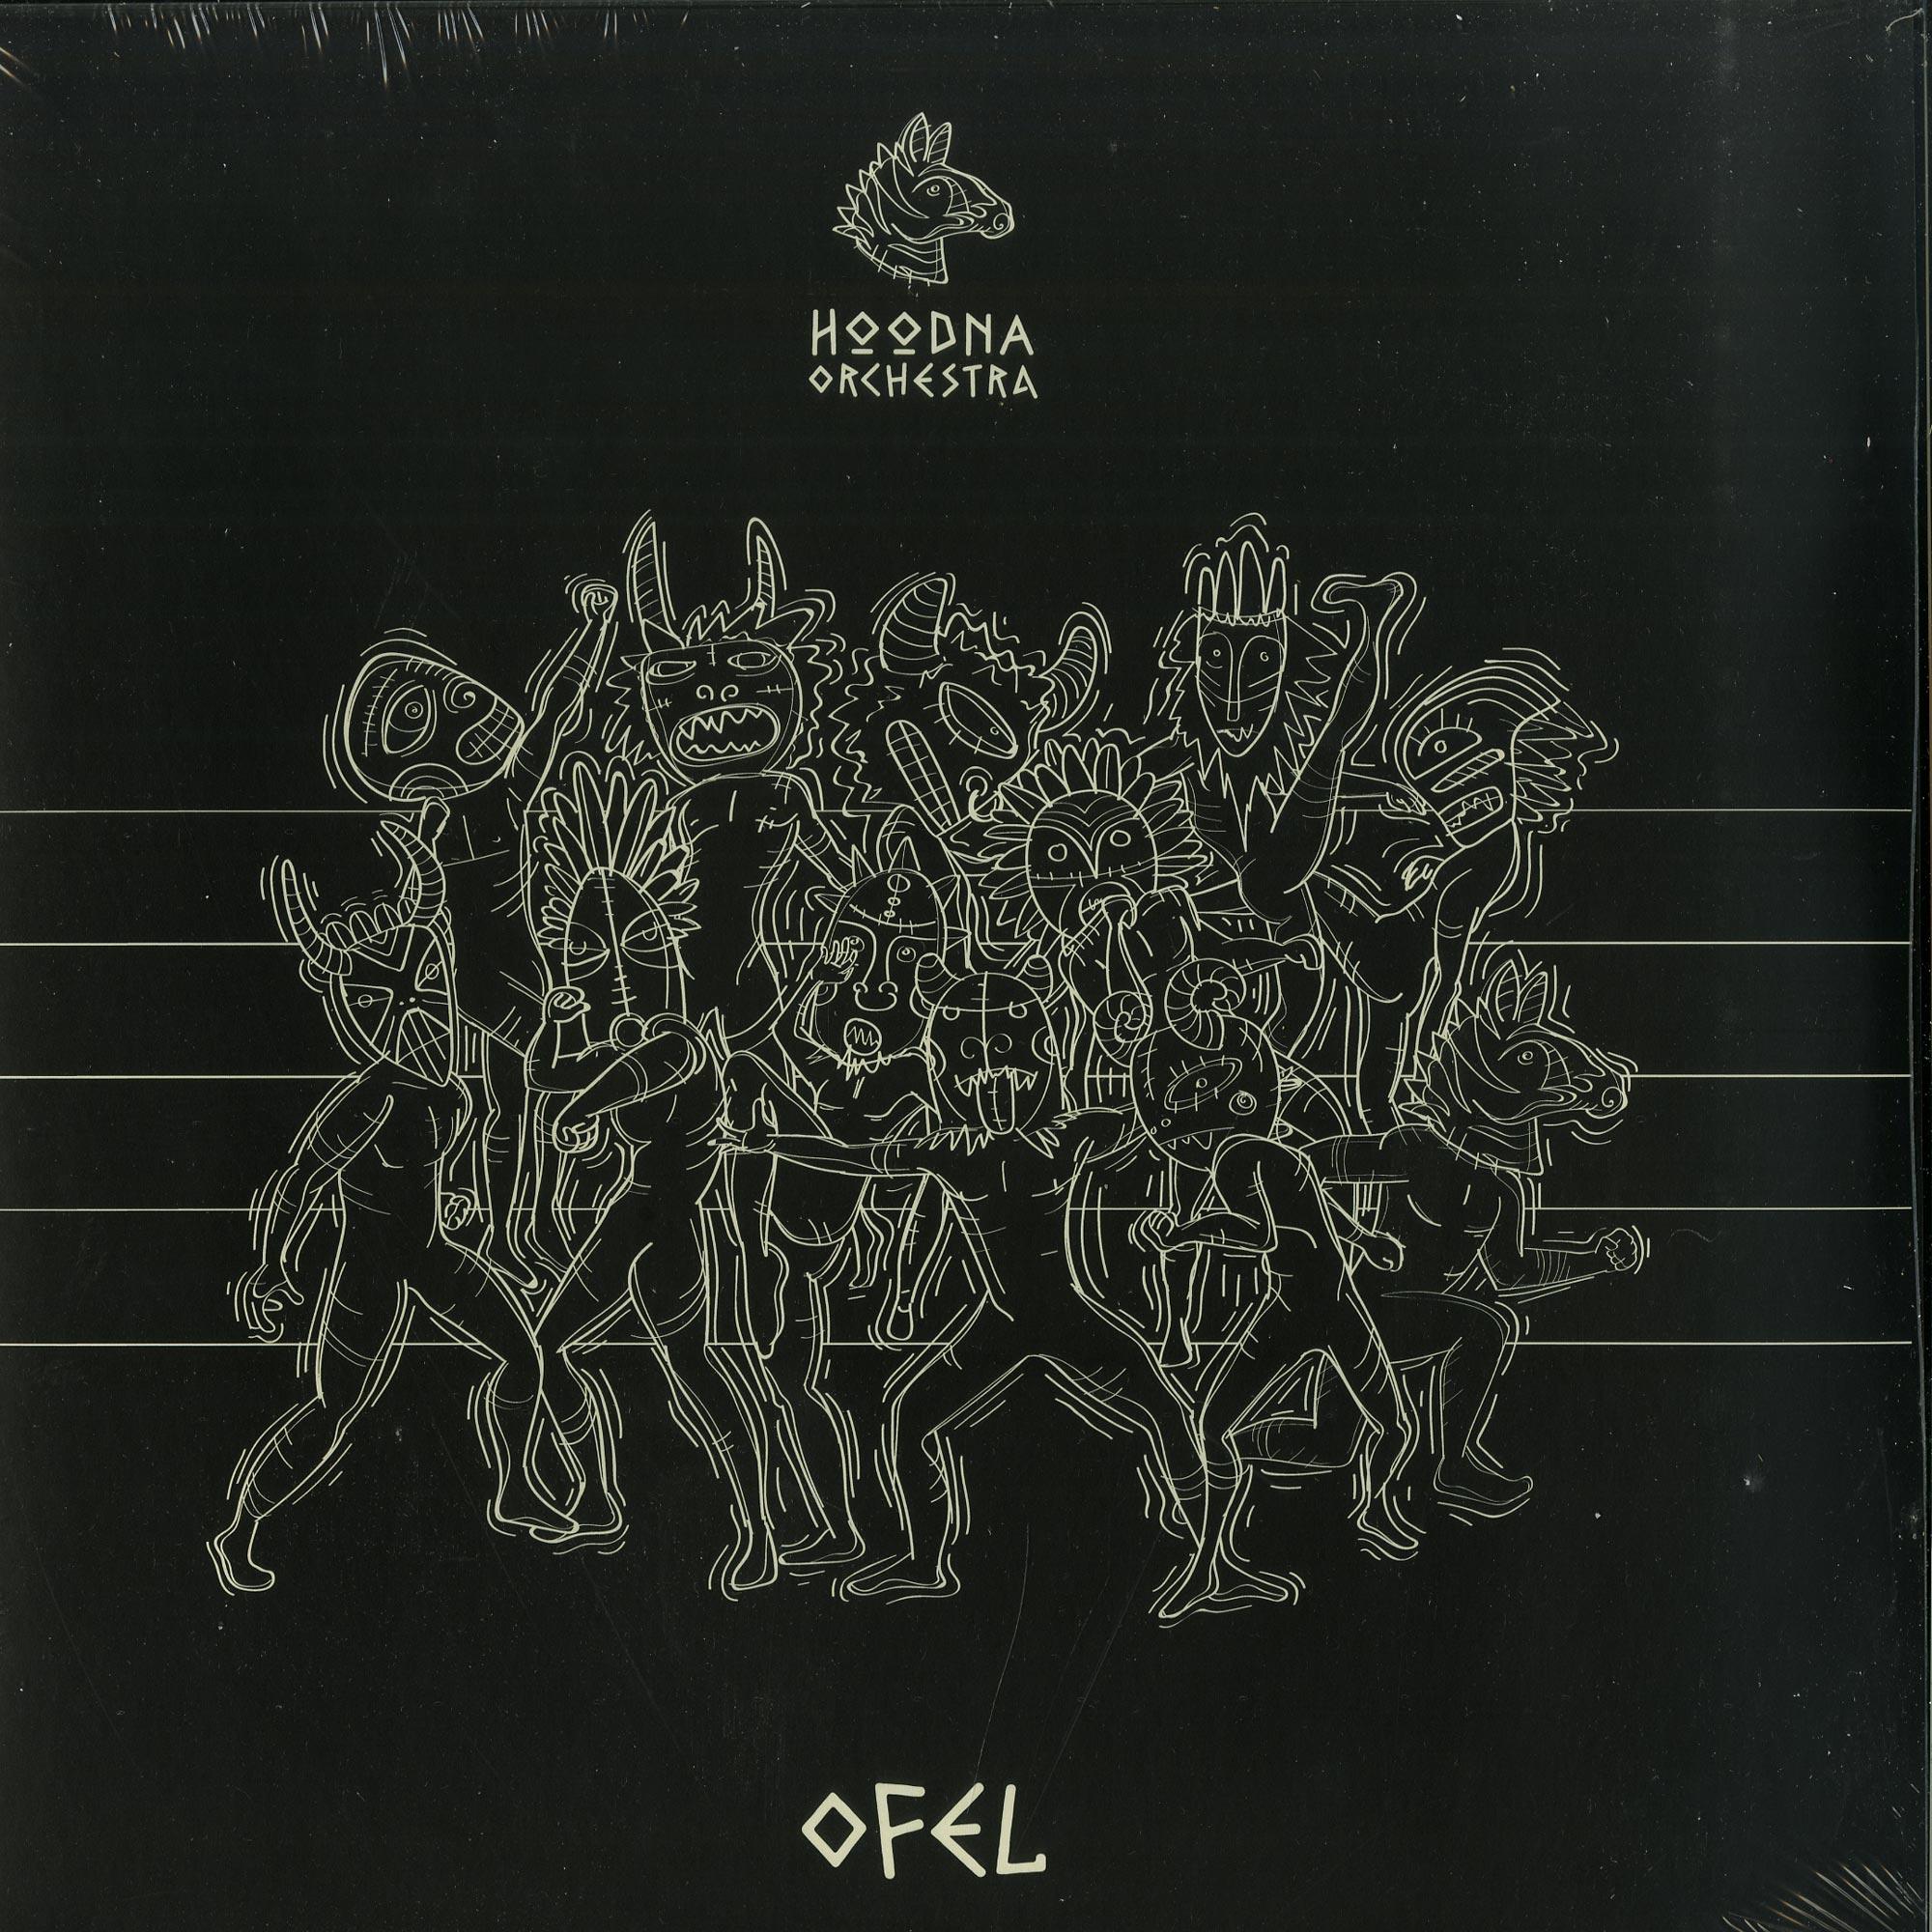 Hoodna Orchestra - OFEL